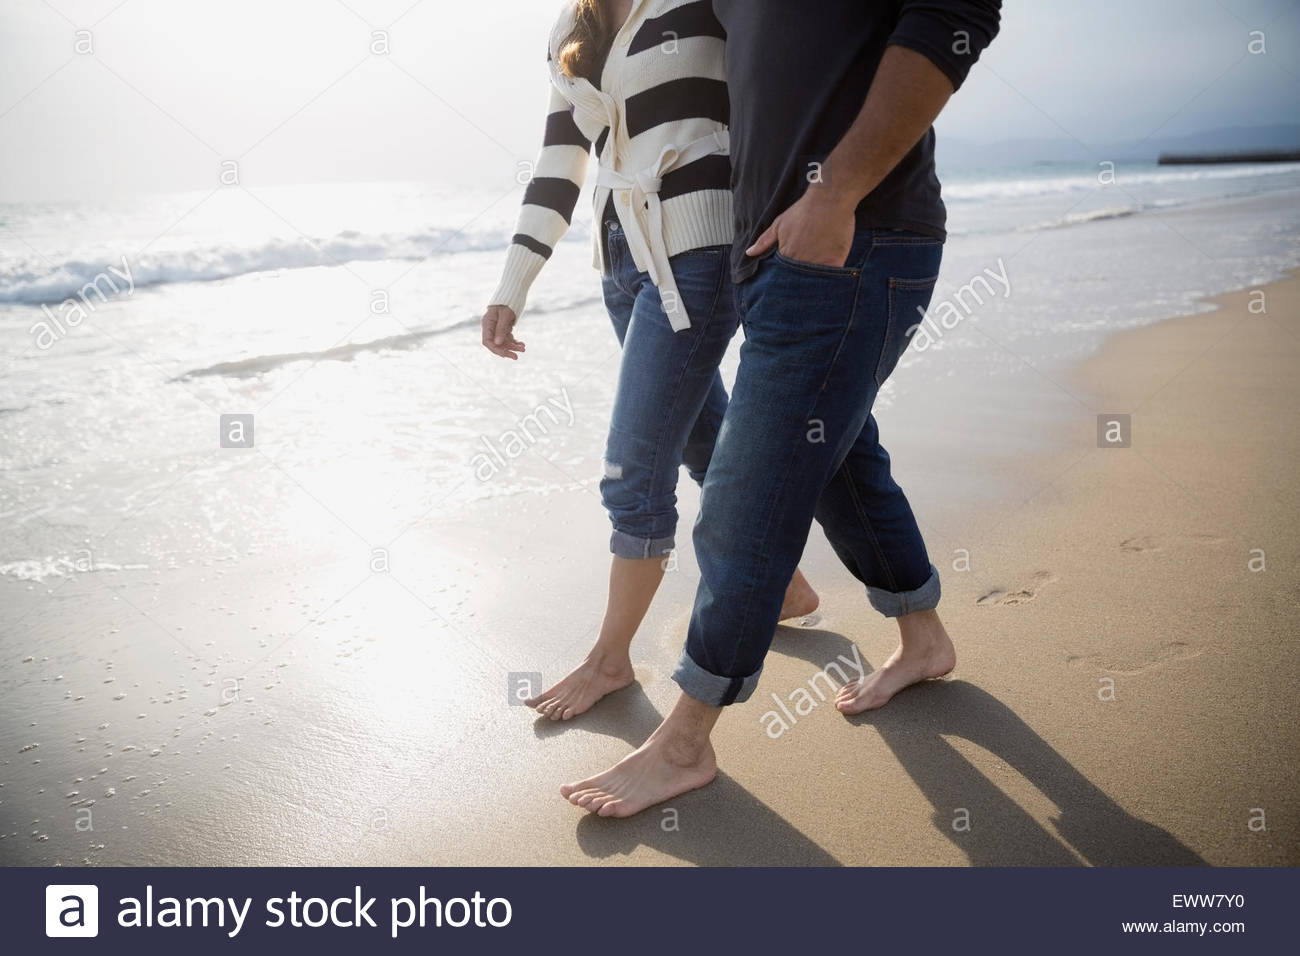 Barefoot couple walking on sunny beach - Stock Image